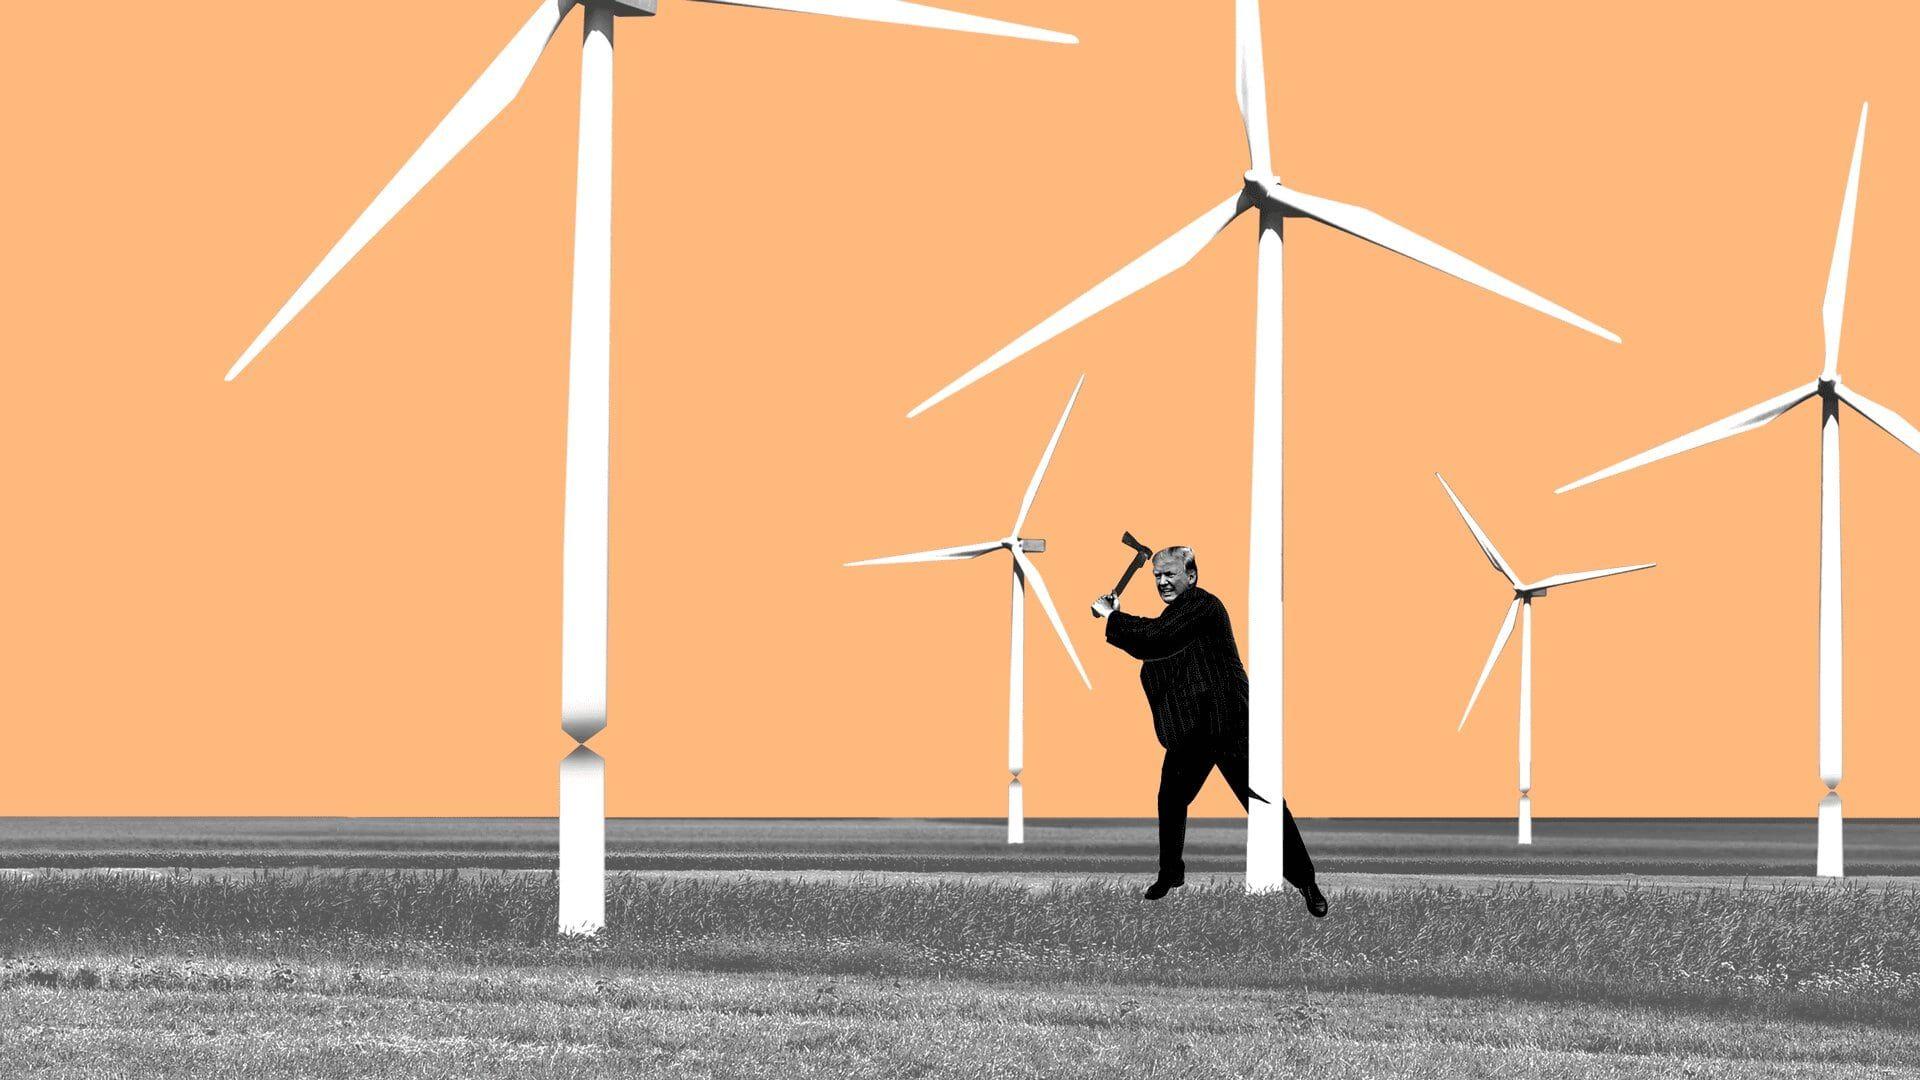 Trump's budget undercuts congressional GOP's climate innovation push - Axios